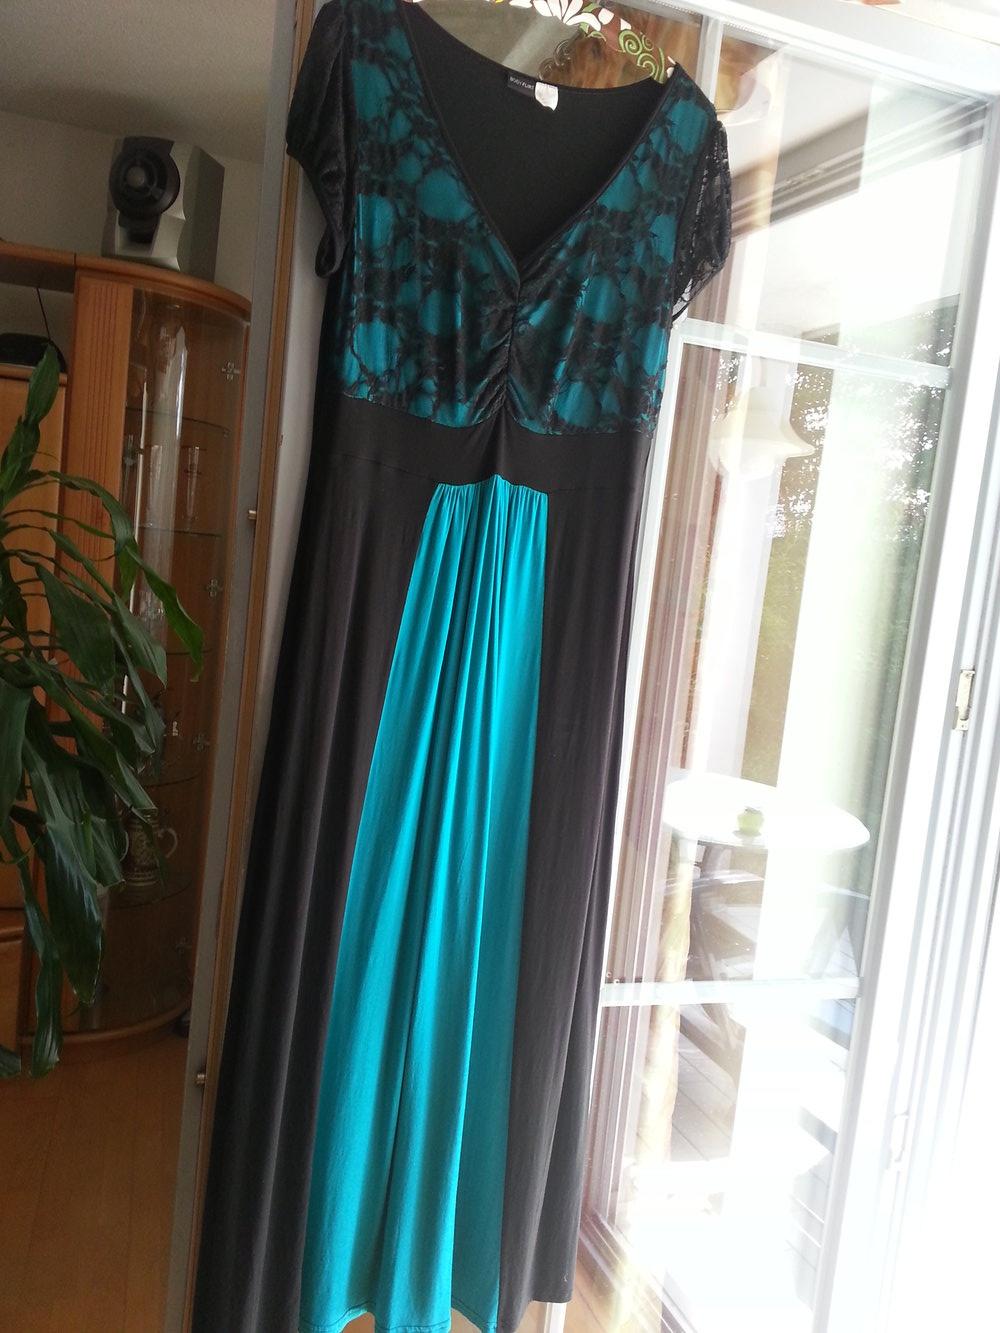 Viskose Kleid :: Kleiderkorb.de